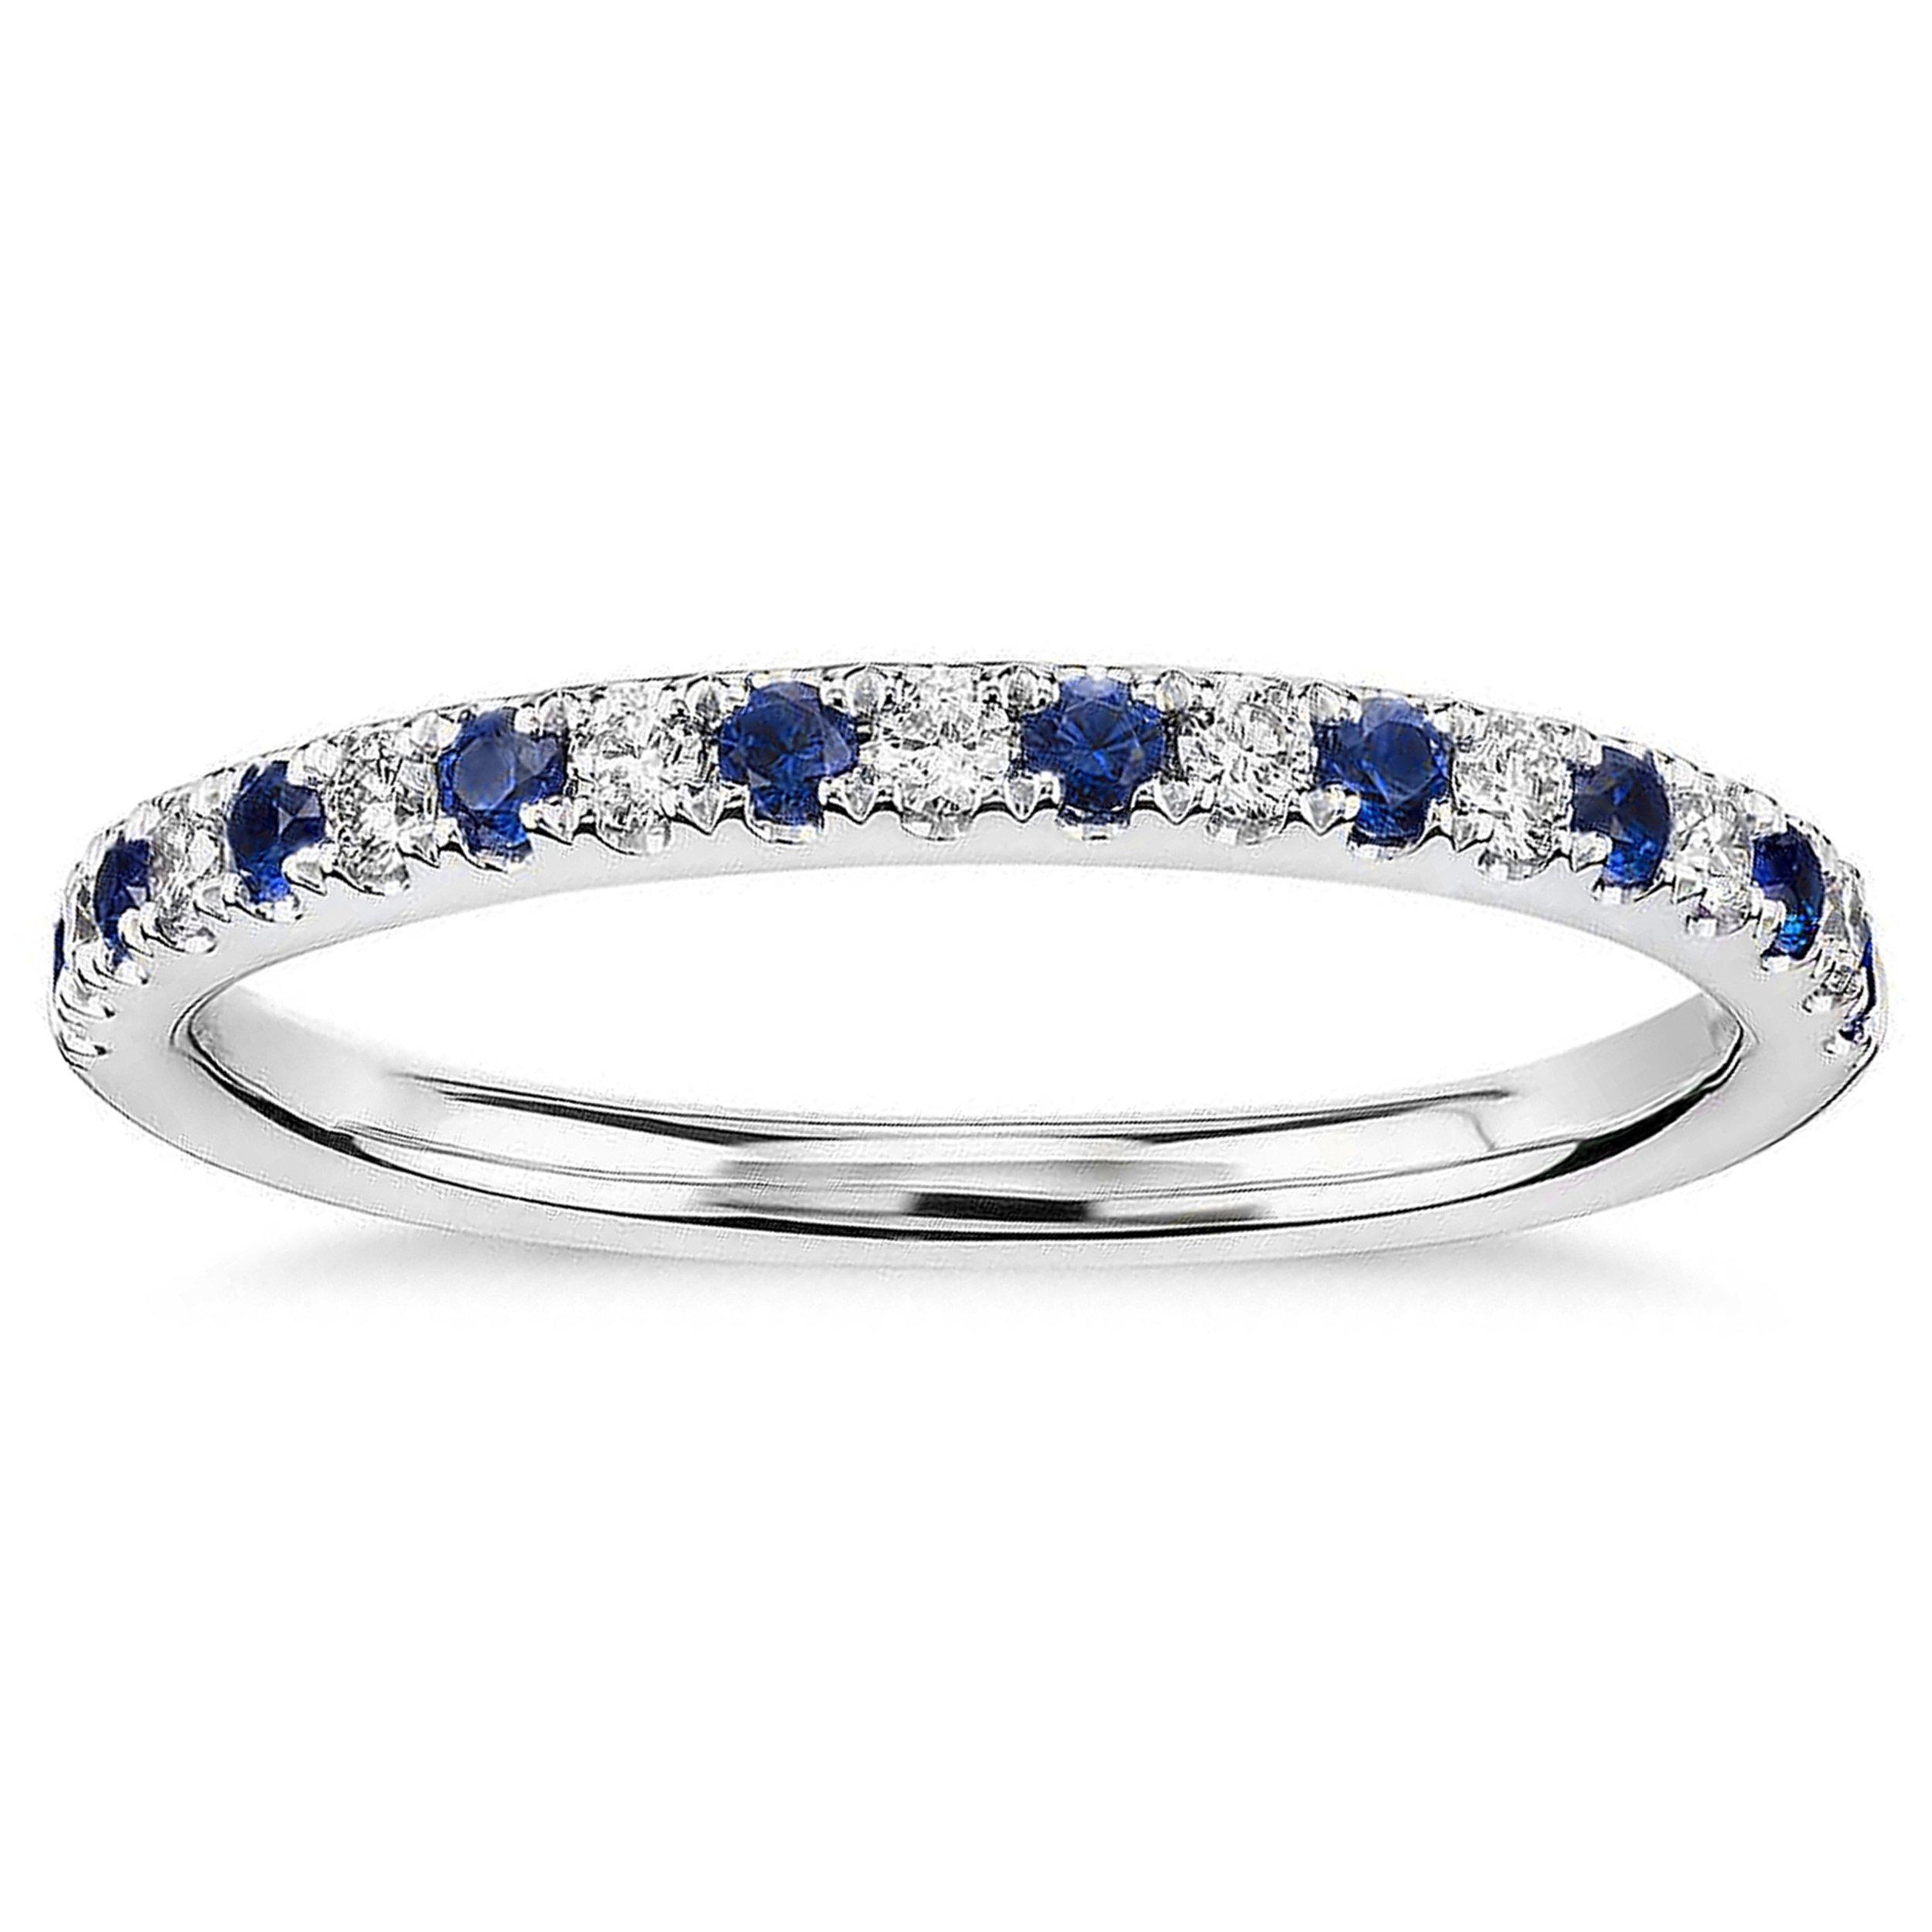 0.60 CT. Round Natural White Diamond & Blue Sapphire Wedding Band 10K White Gold For Women